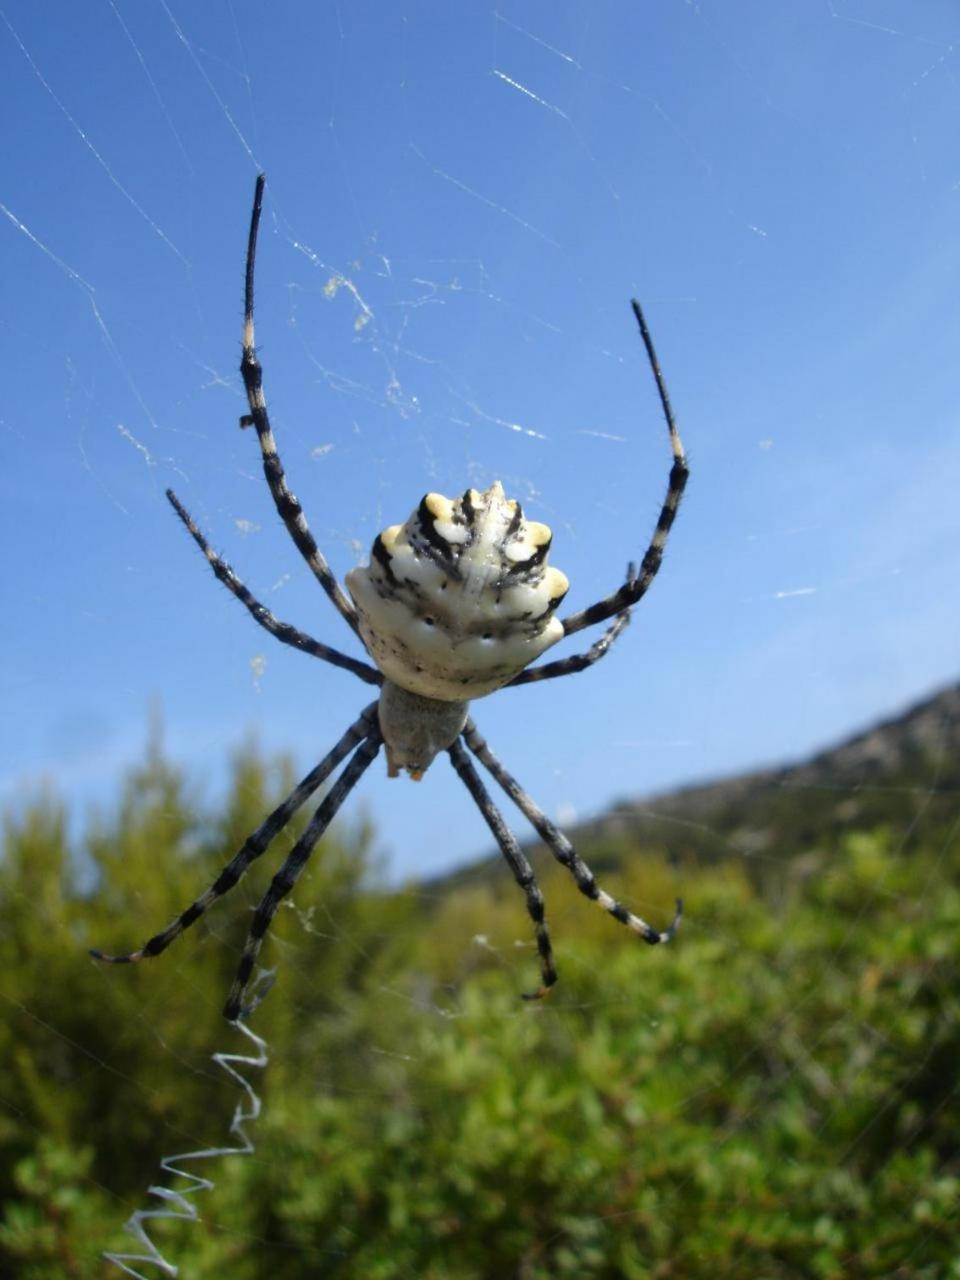 Spider in Es Vedrà Nature Reserve, Ibiza.